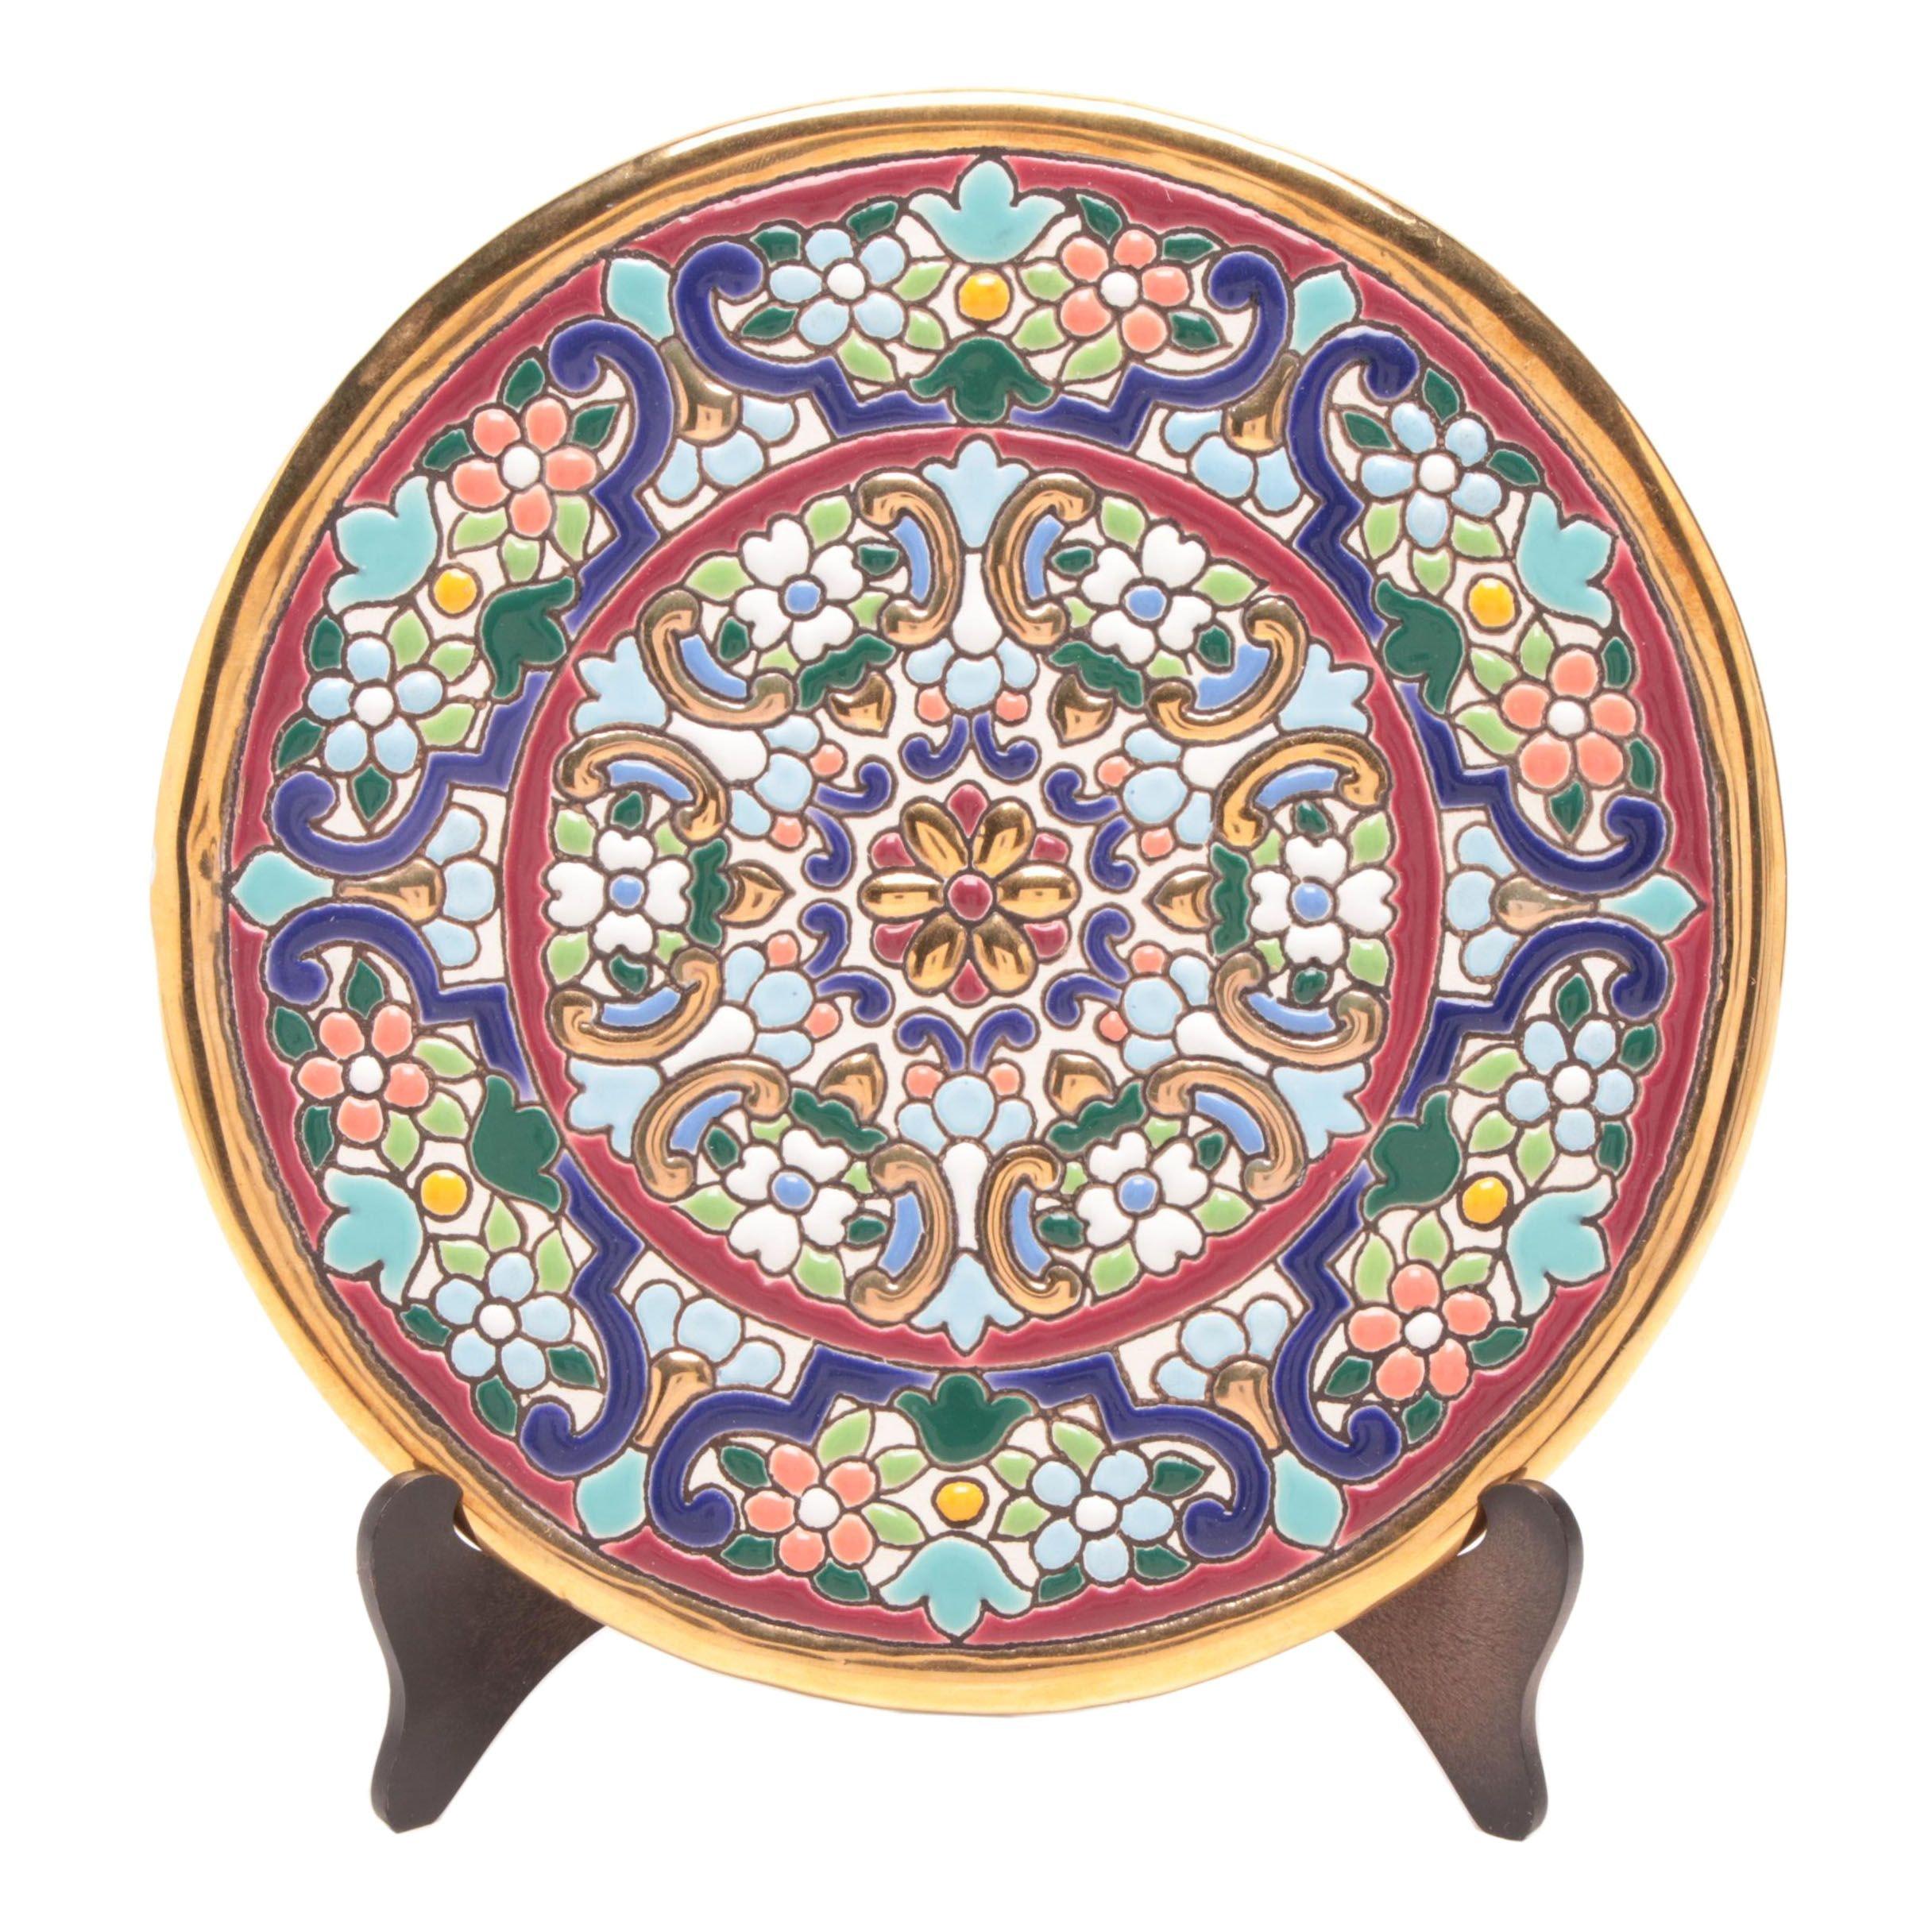 Spanish Sevillarte Ceramic Enameled Plate with 24K Gold Decoration